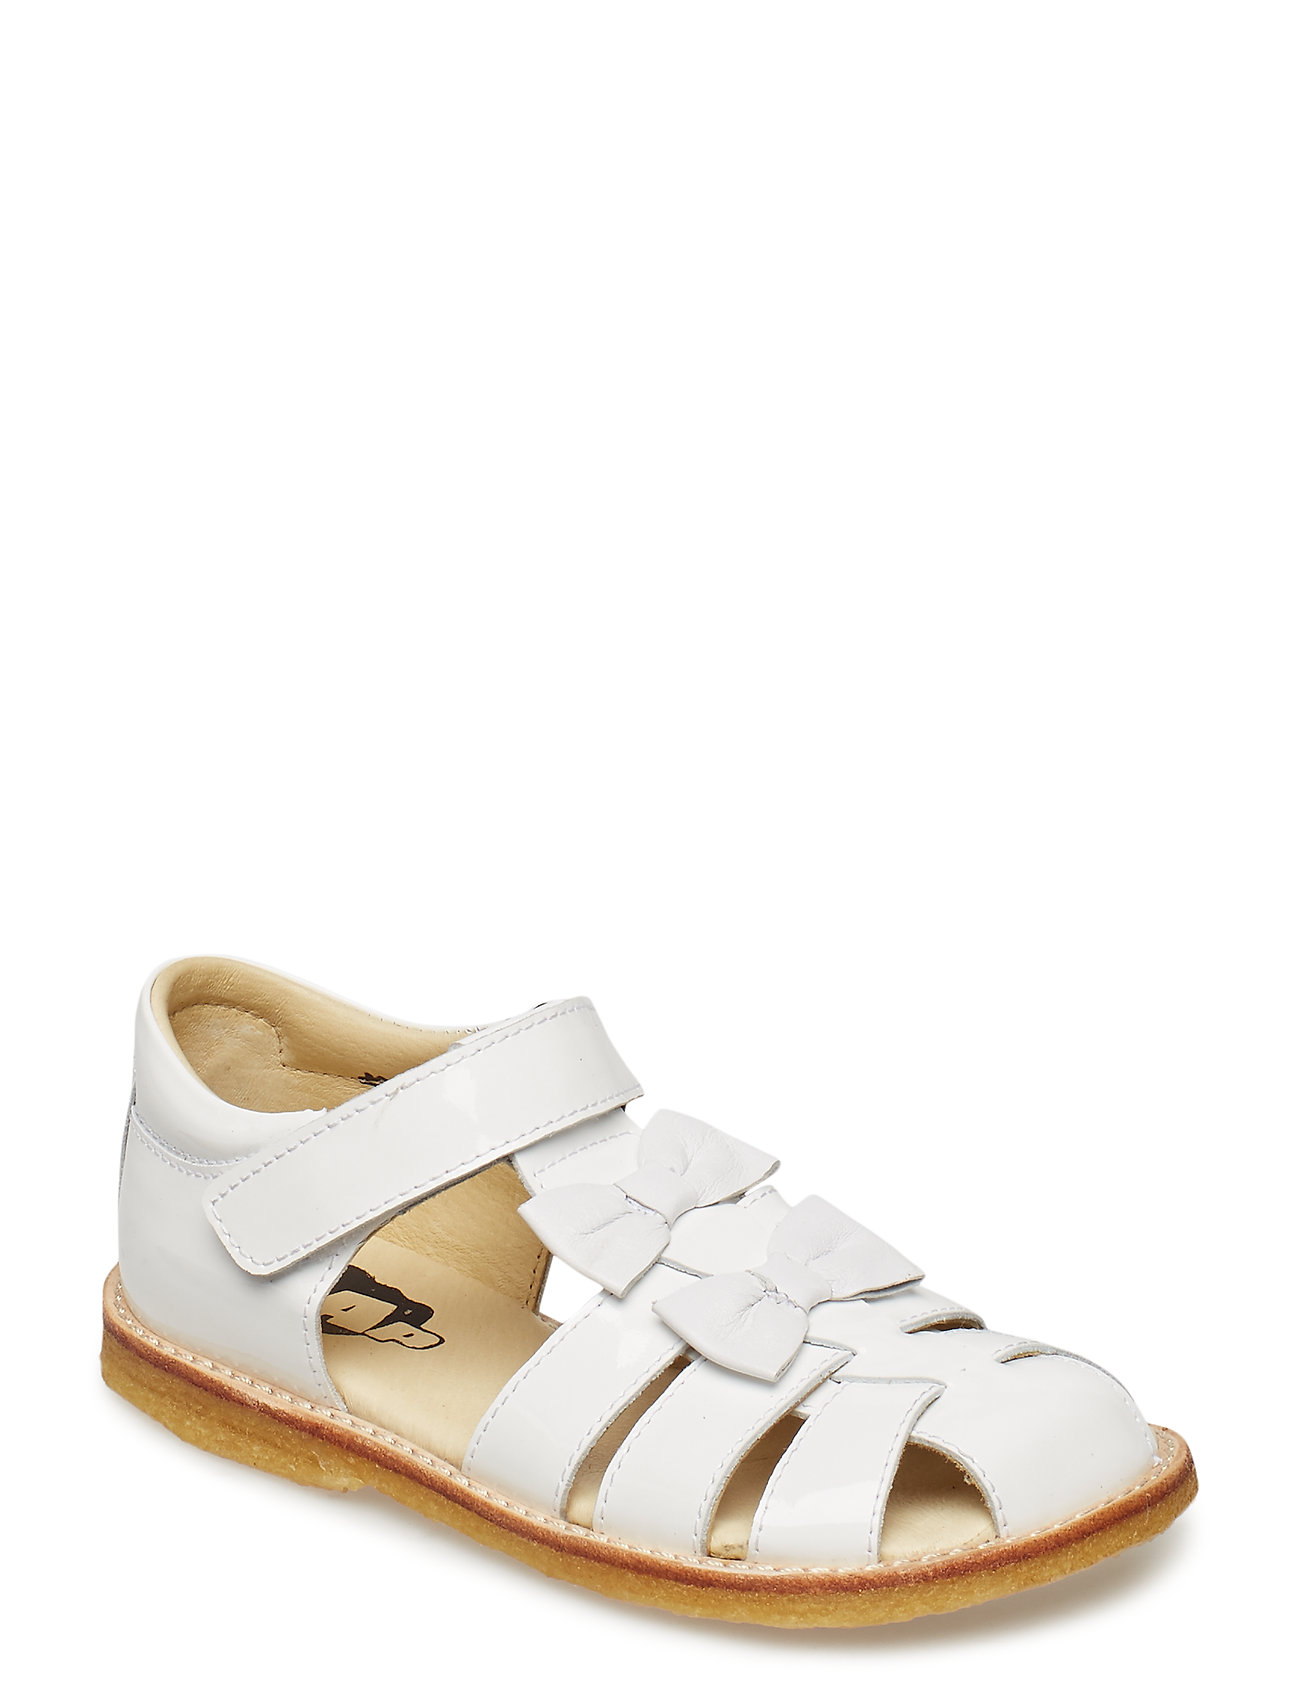 f4bb980249d A1-PAT WHITE Arauto RAP Hand Made Sandal sandaler for børn - Pashion.dk